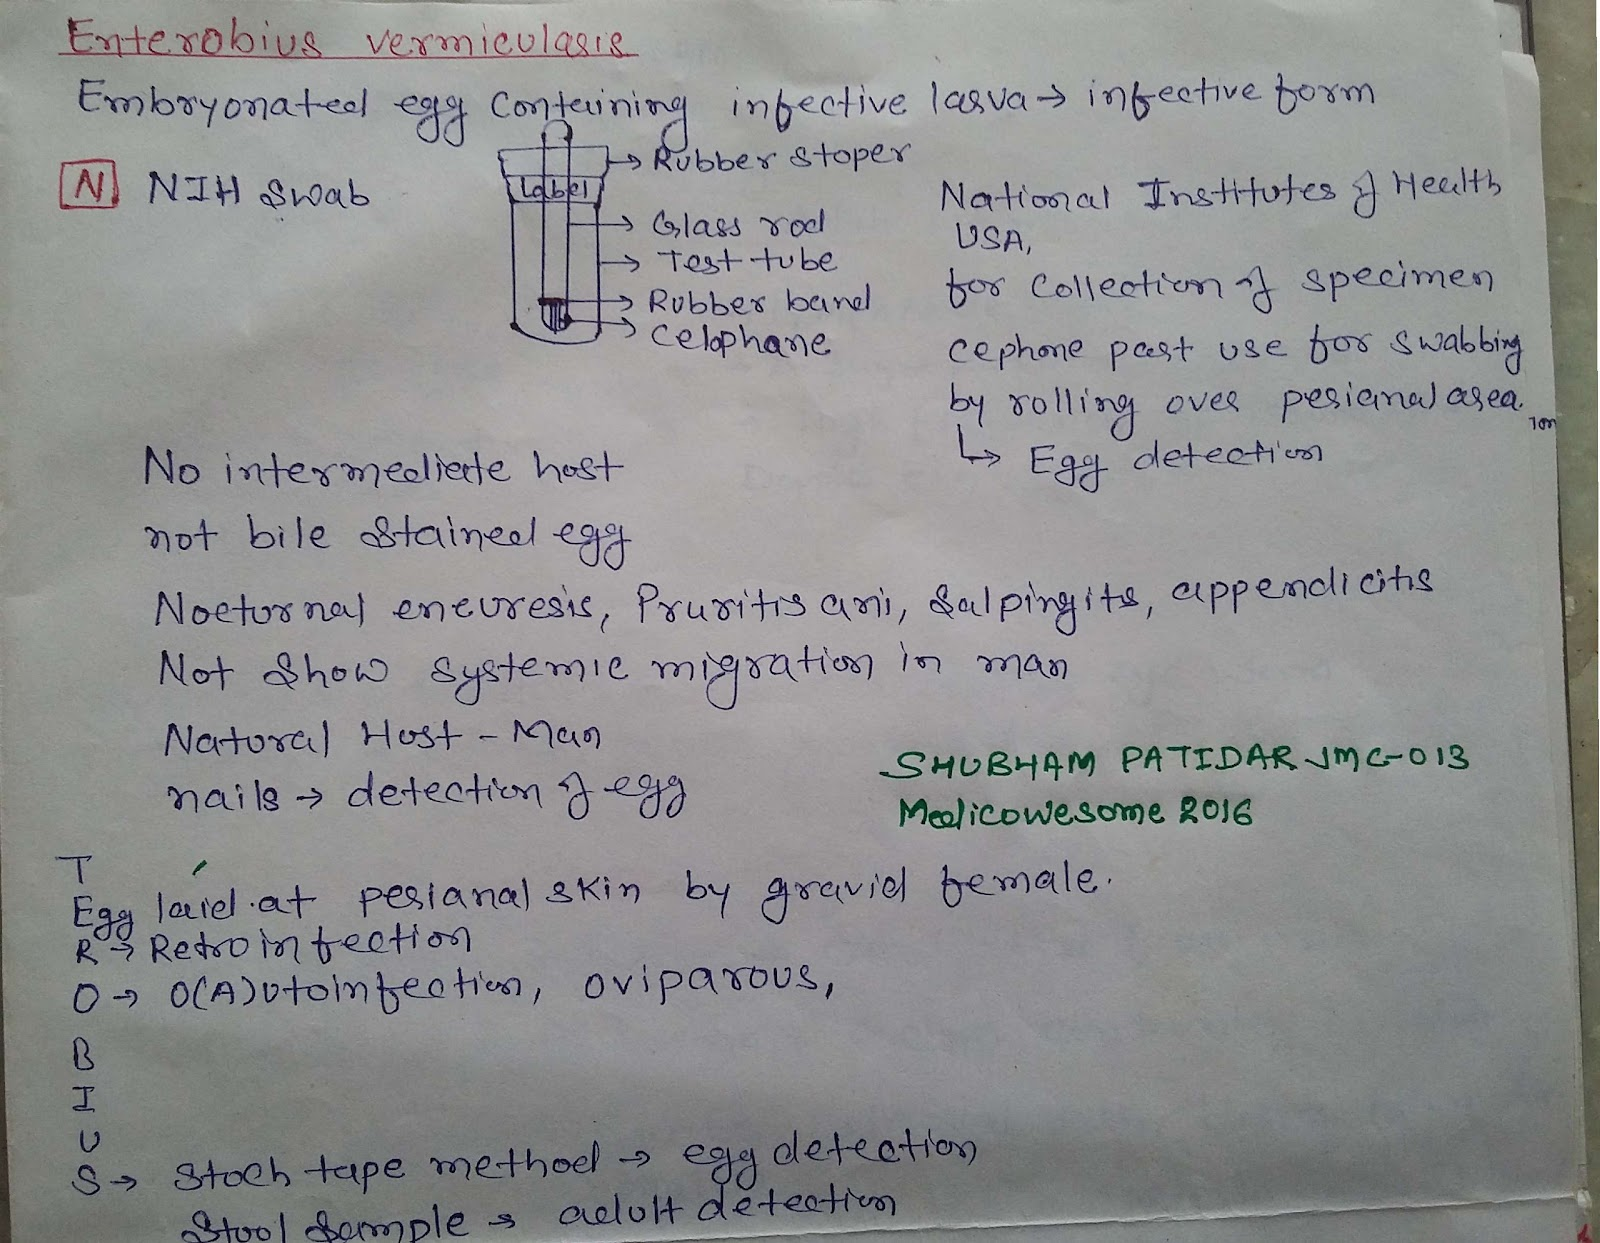 enterobius vermicularis nih swab